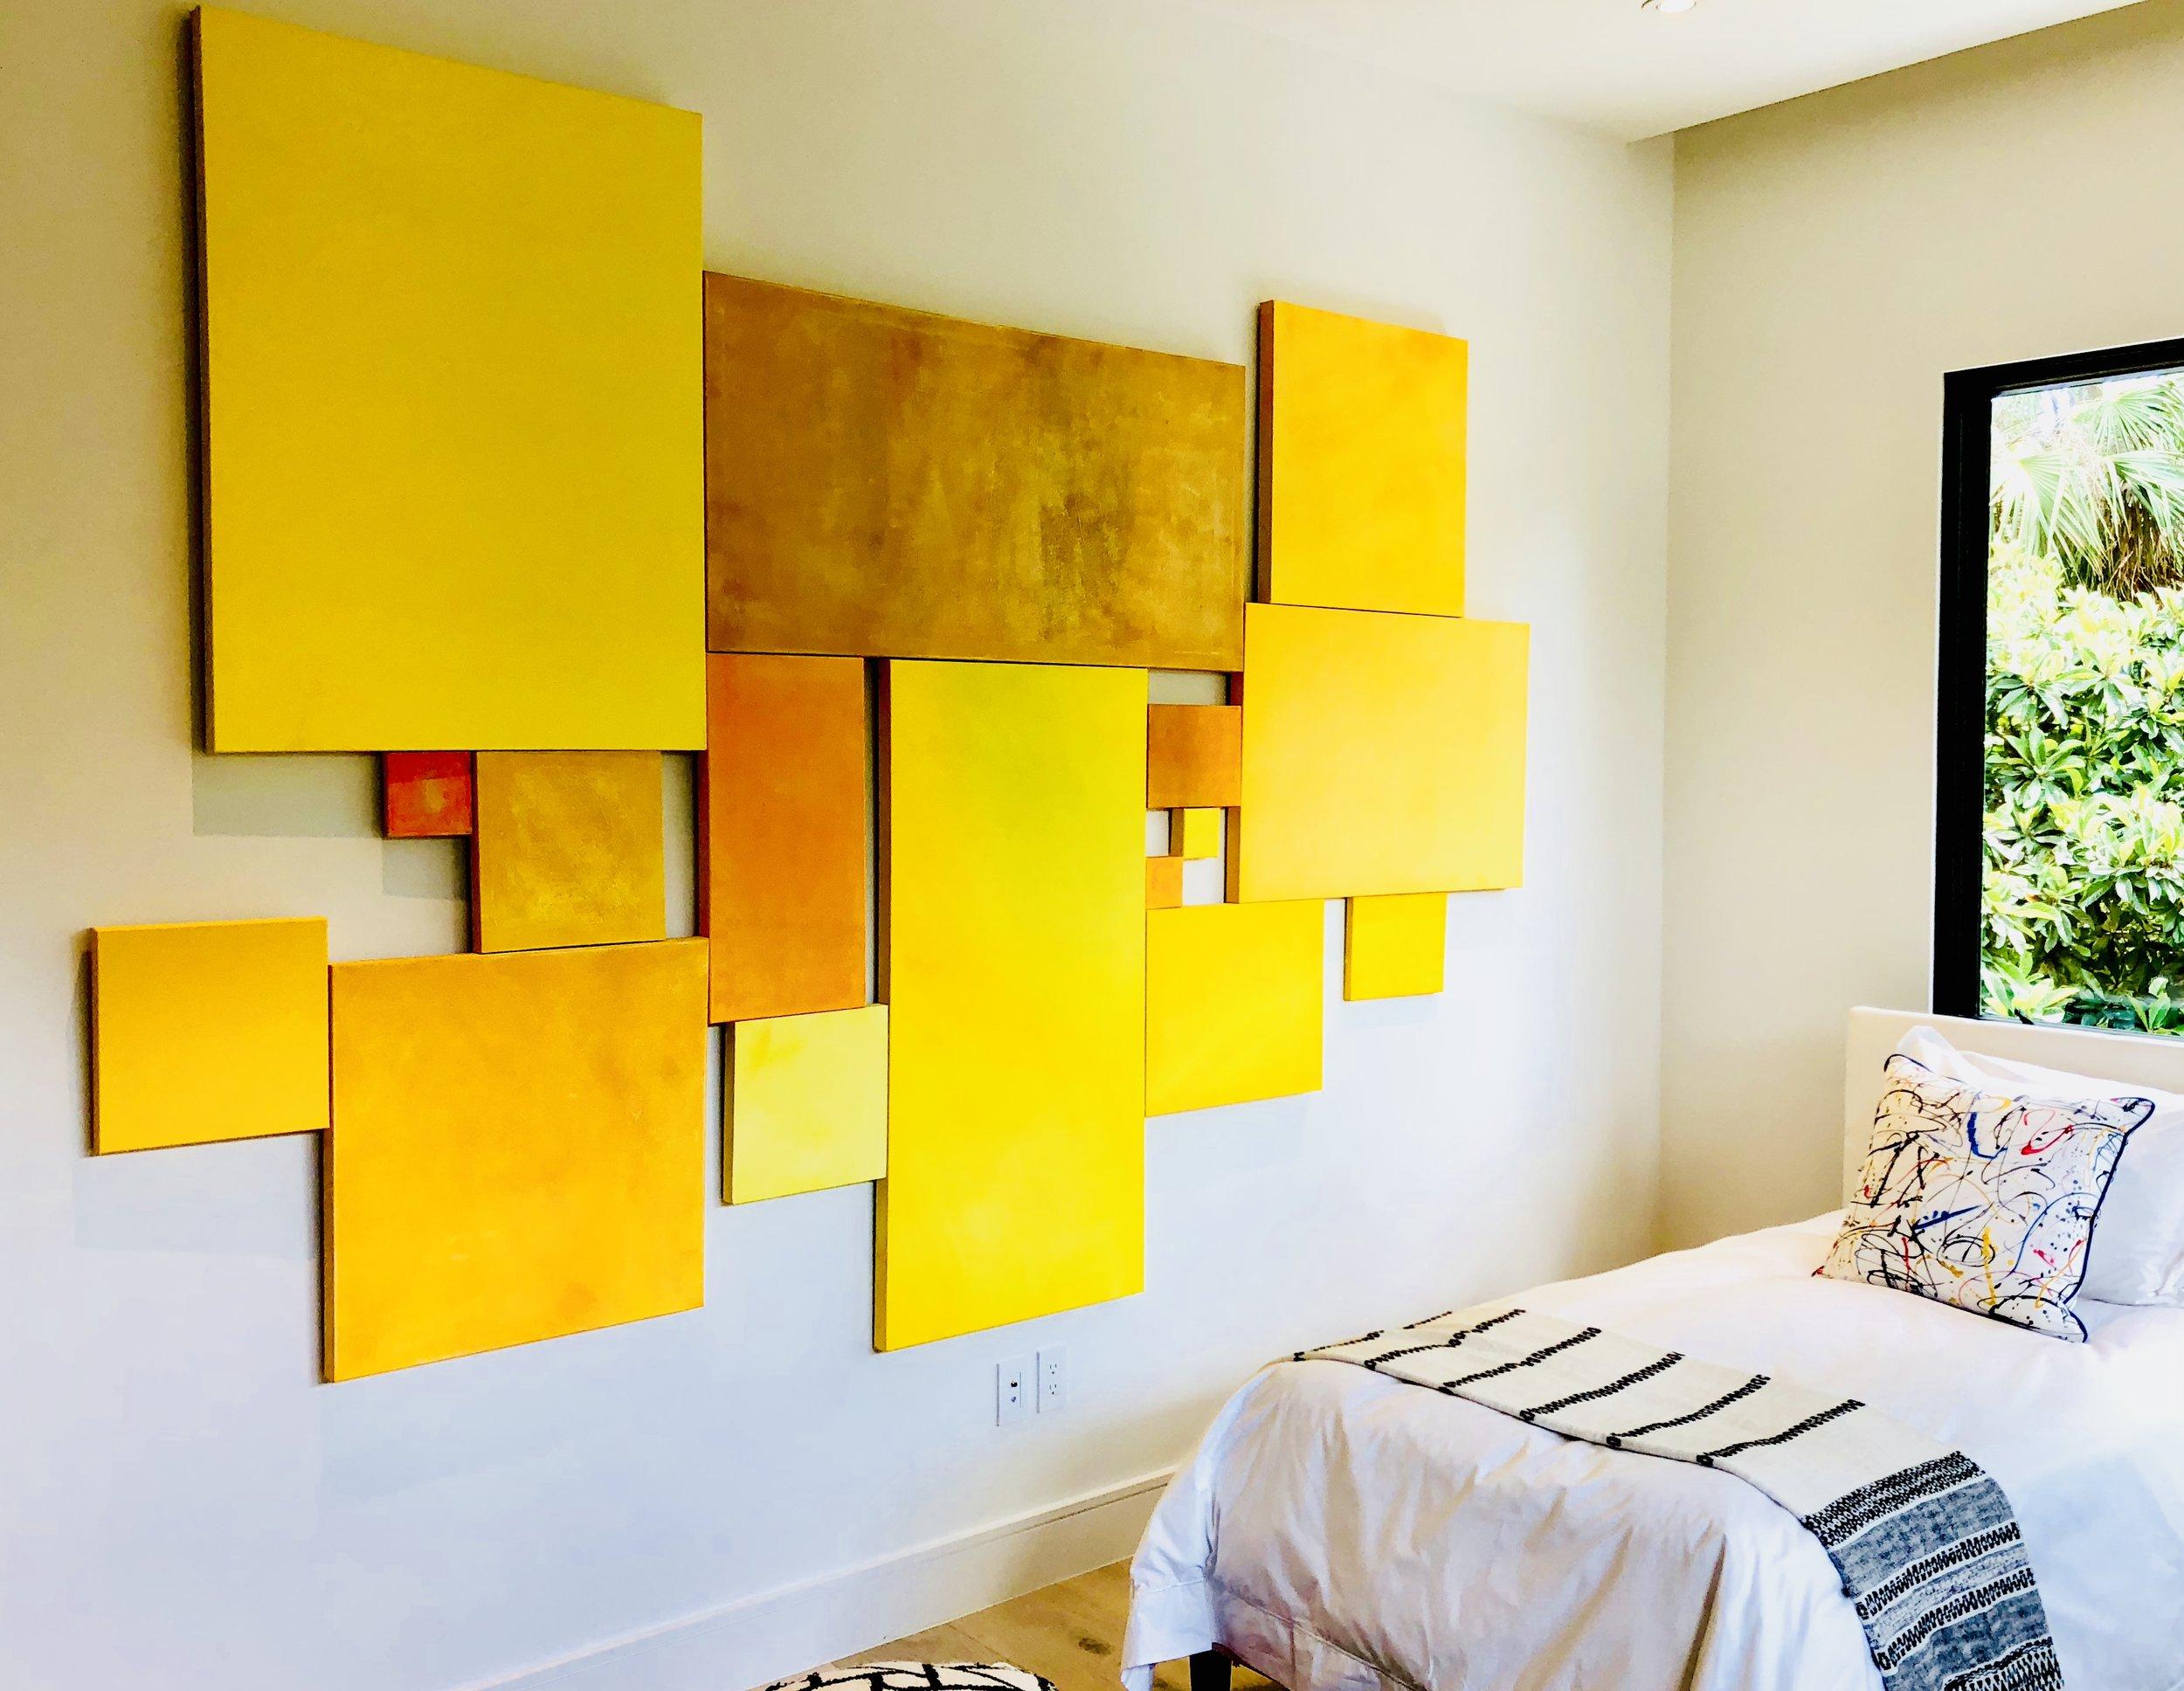 Yellow Canvas Wall Montage:  $6000. Krista Berman